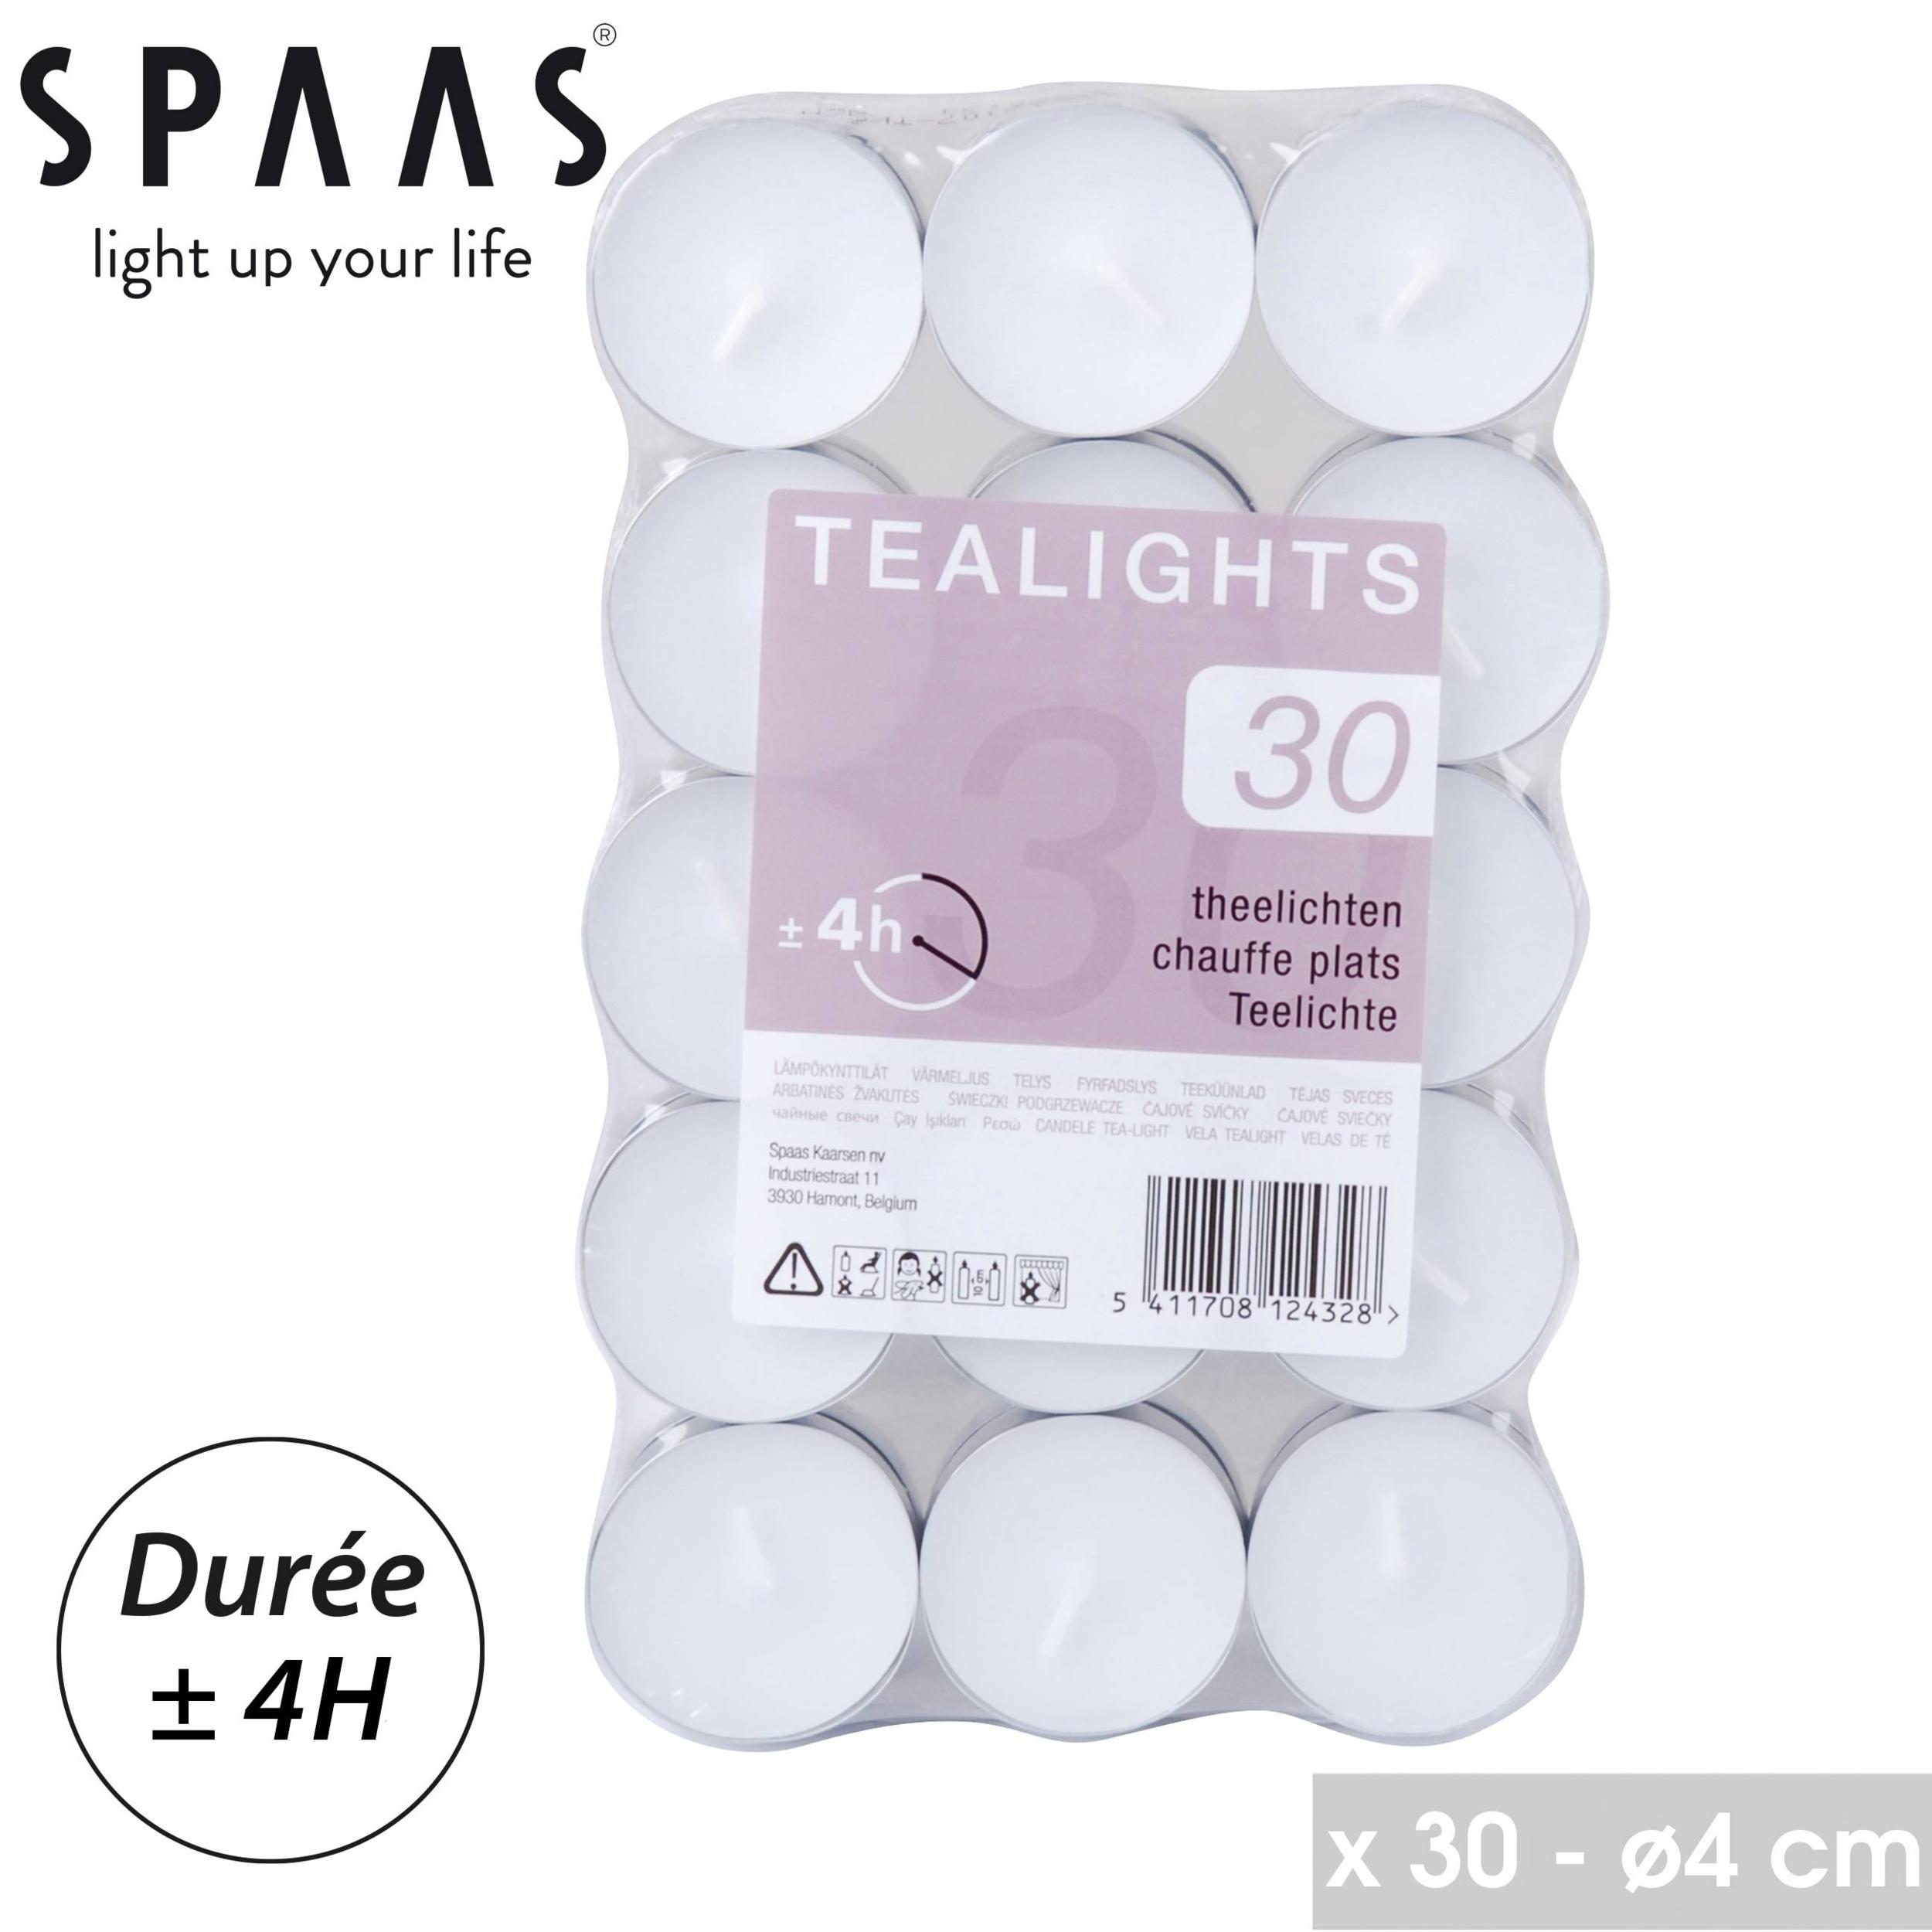 SPAAS - BOUGIES CHAUFFE-PLATS X 30 - COULEUR BLANC